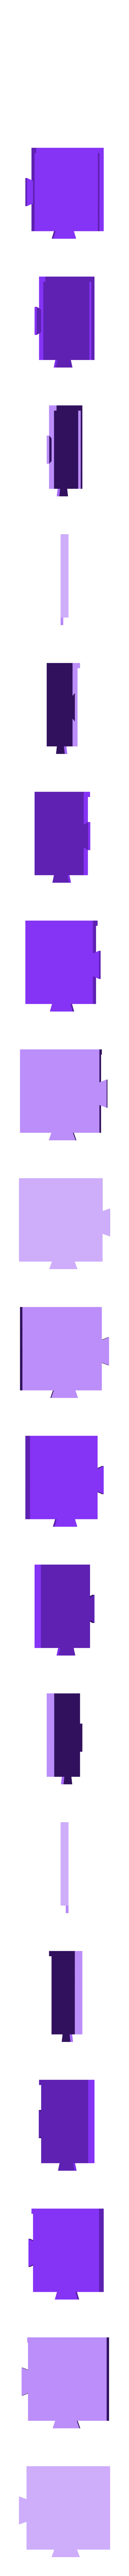 M-Corner.STL Download free STL file SNAP fit chess/game board • 3D printer object, juglaz